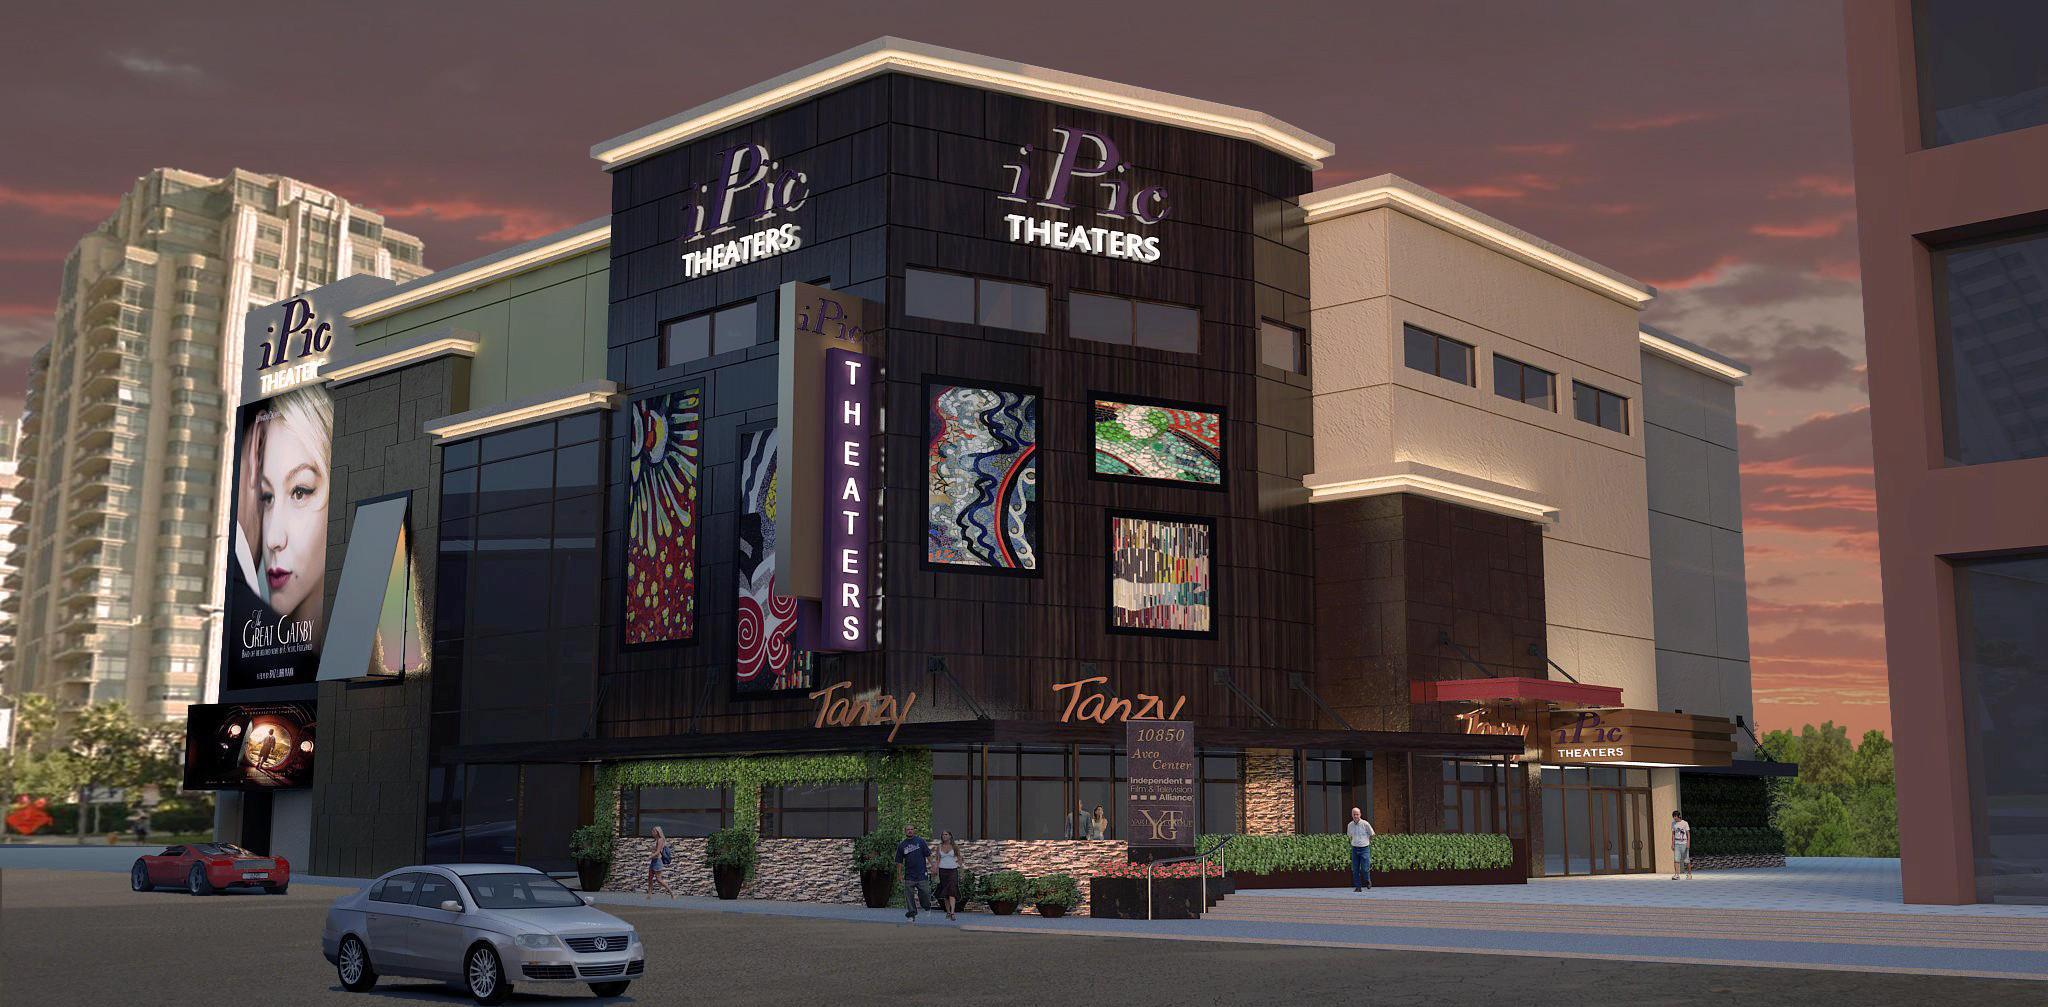 la-et-ct-ipic-theater-20140403-001.jpg